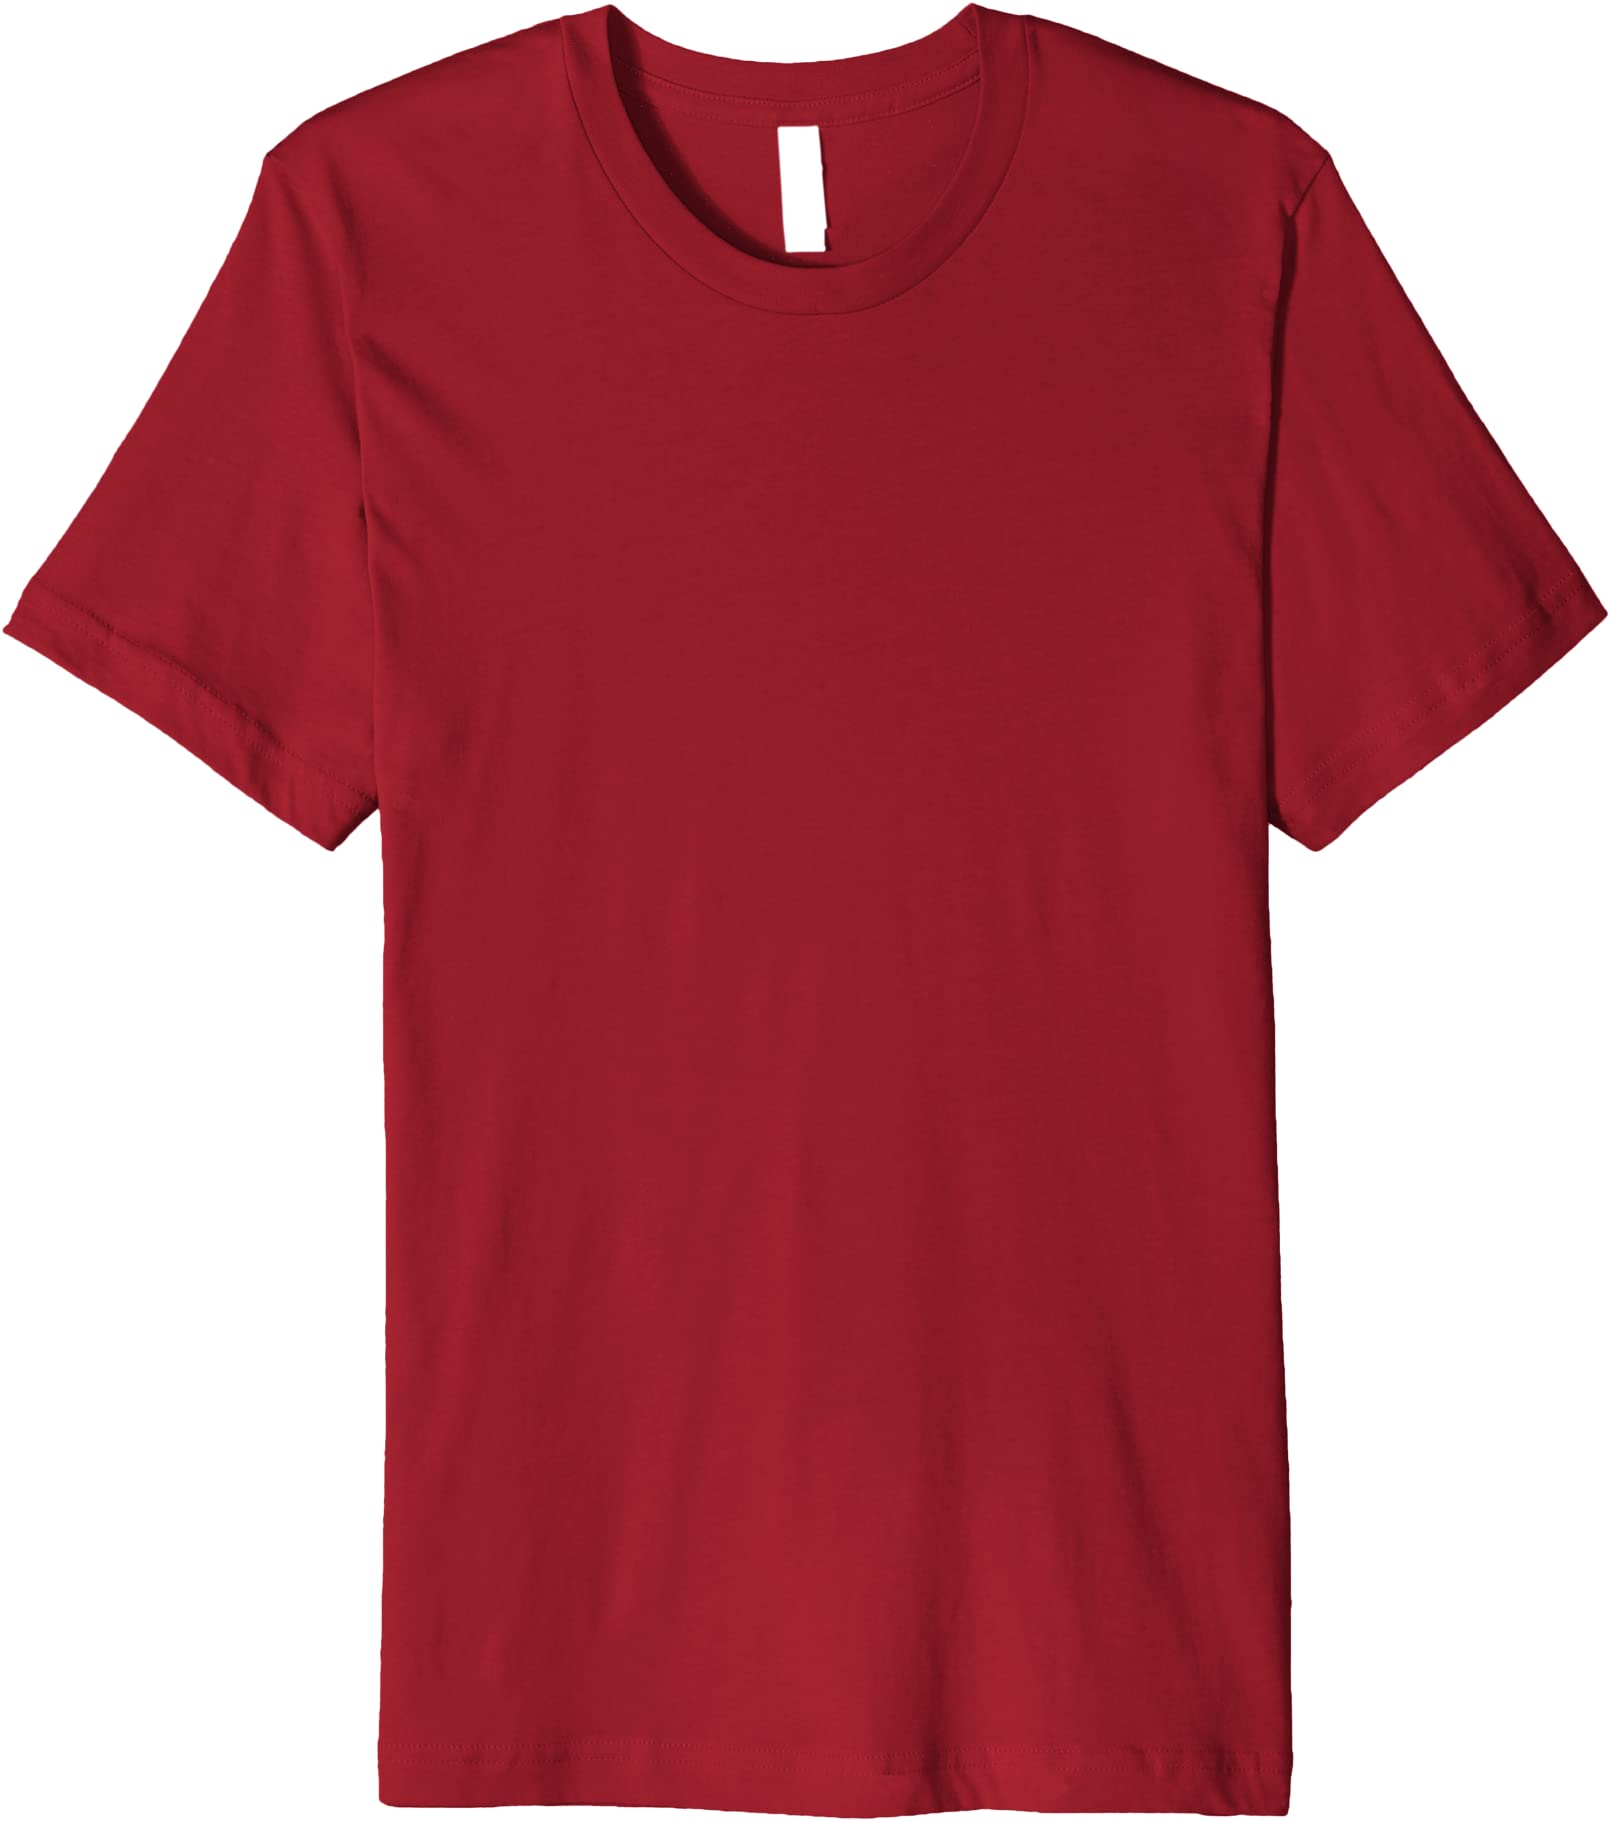 Kiss My Class Goodbye 2018 Premium T-Shirt Graduation Ultra Soft Shirt Tee of